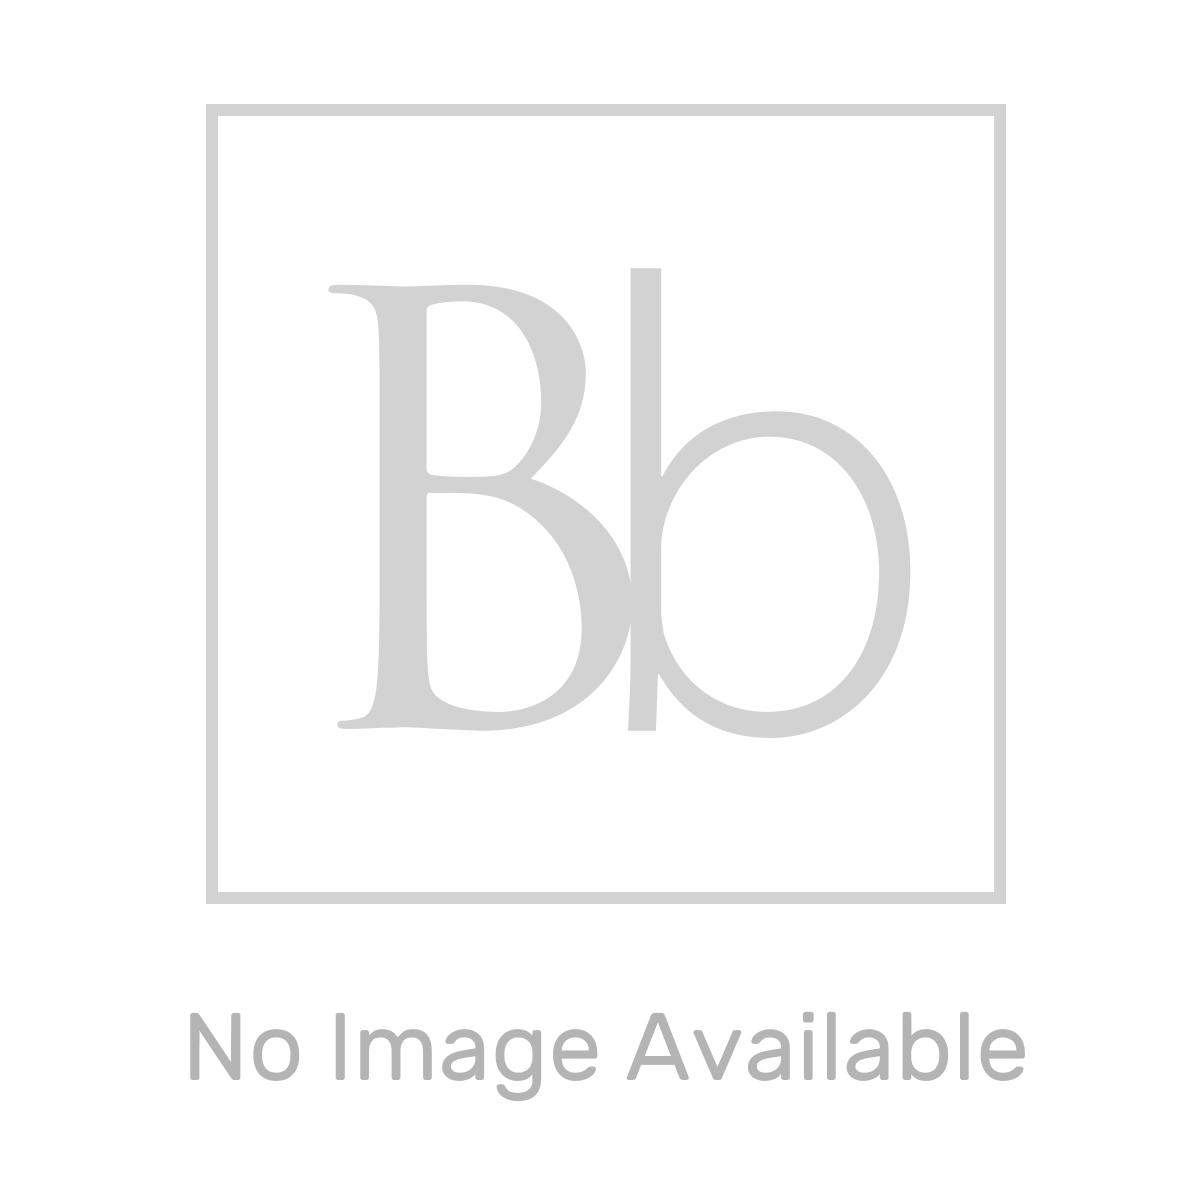 Frontline Holborn Traditional Arched Bathroom Mirror